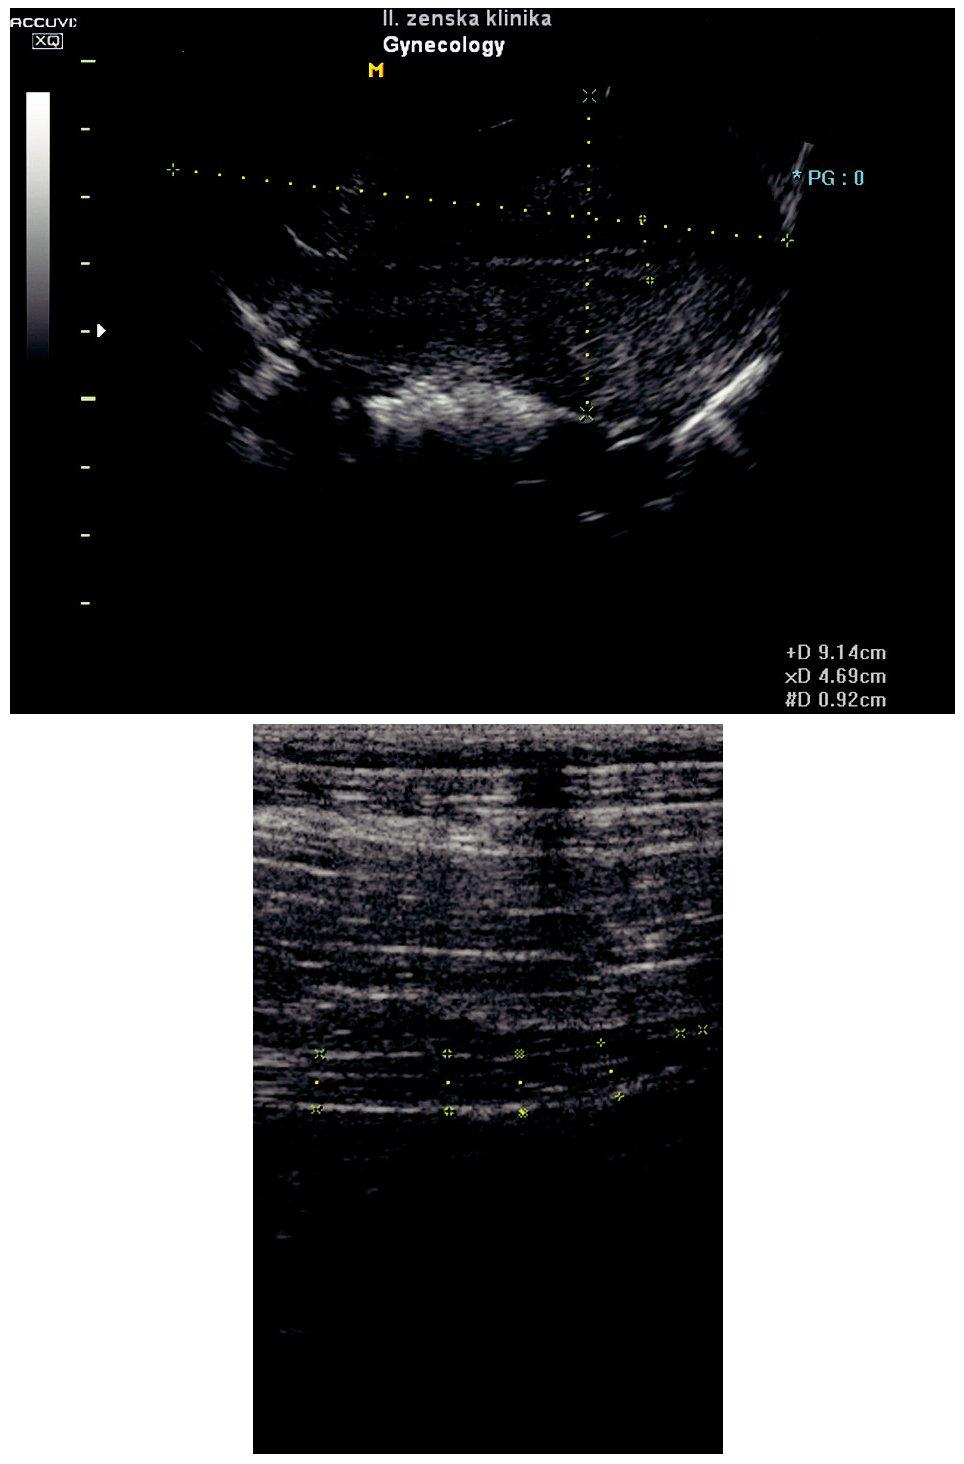 a) USG uteru v I. trimestri gravidity,  b) USG apendixu bez zápalových zmien v I. trimestri gravidity Pic. 3 a) USG of the womb in the first trimester of gravidity, b) USG of the appendix without inflammatory changes in the first trimester of gestation